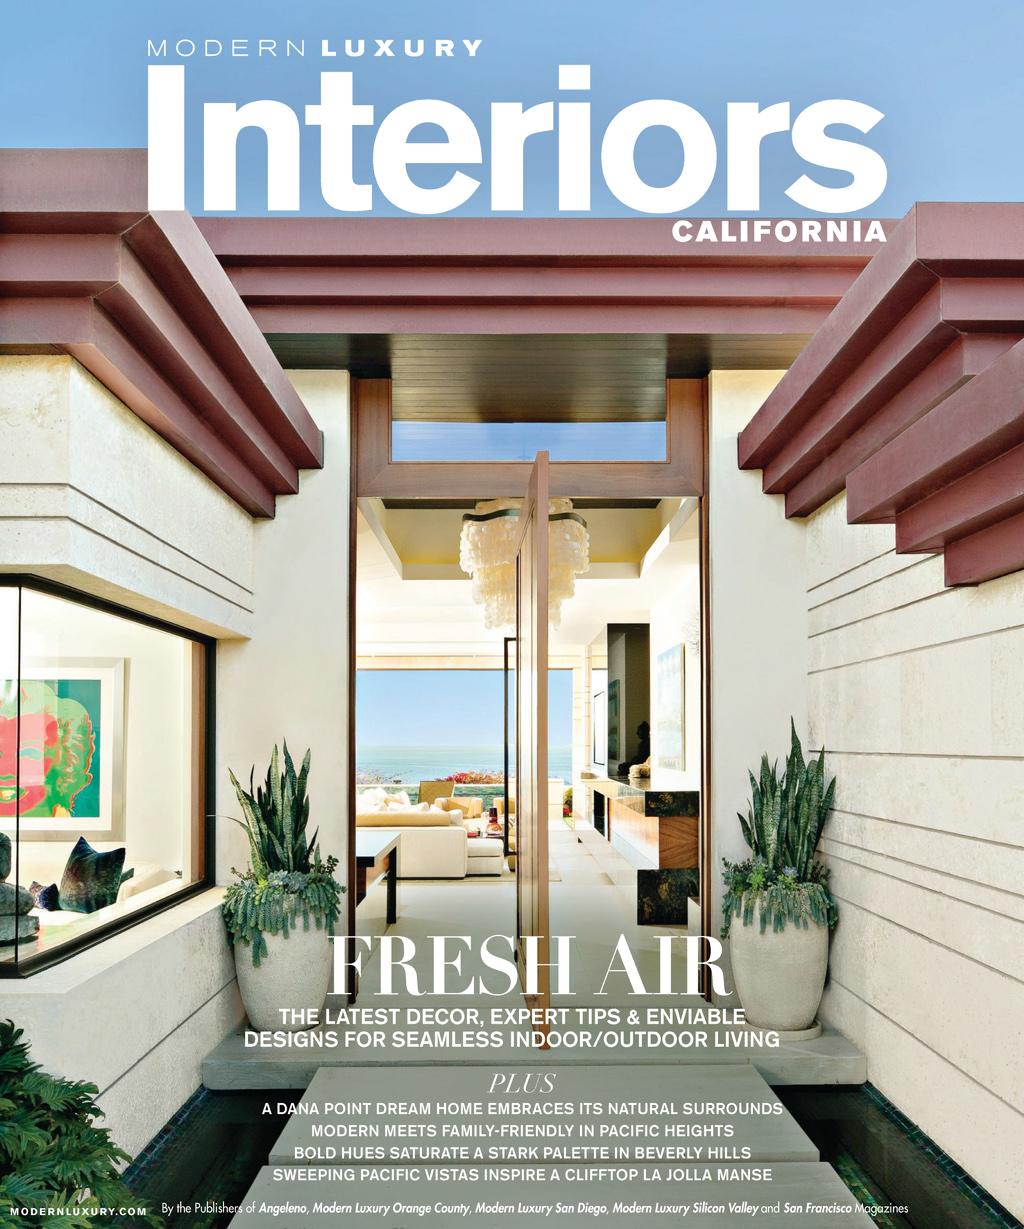 Modern Luxury Interiors California Digital Edition _ Modern Luxury1-1.png